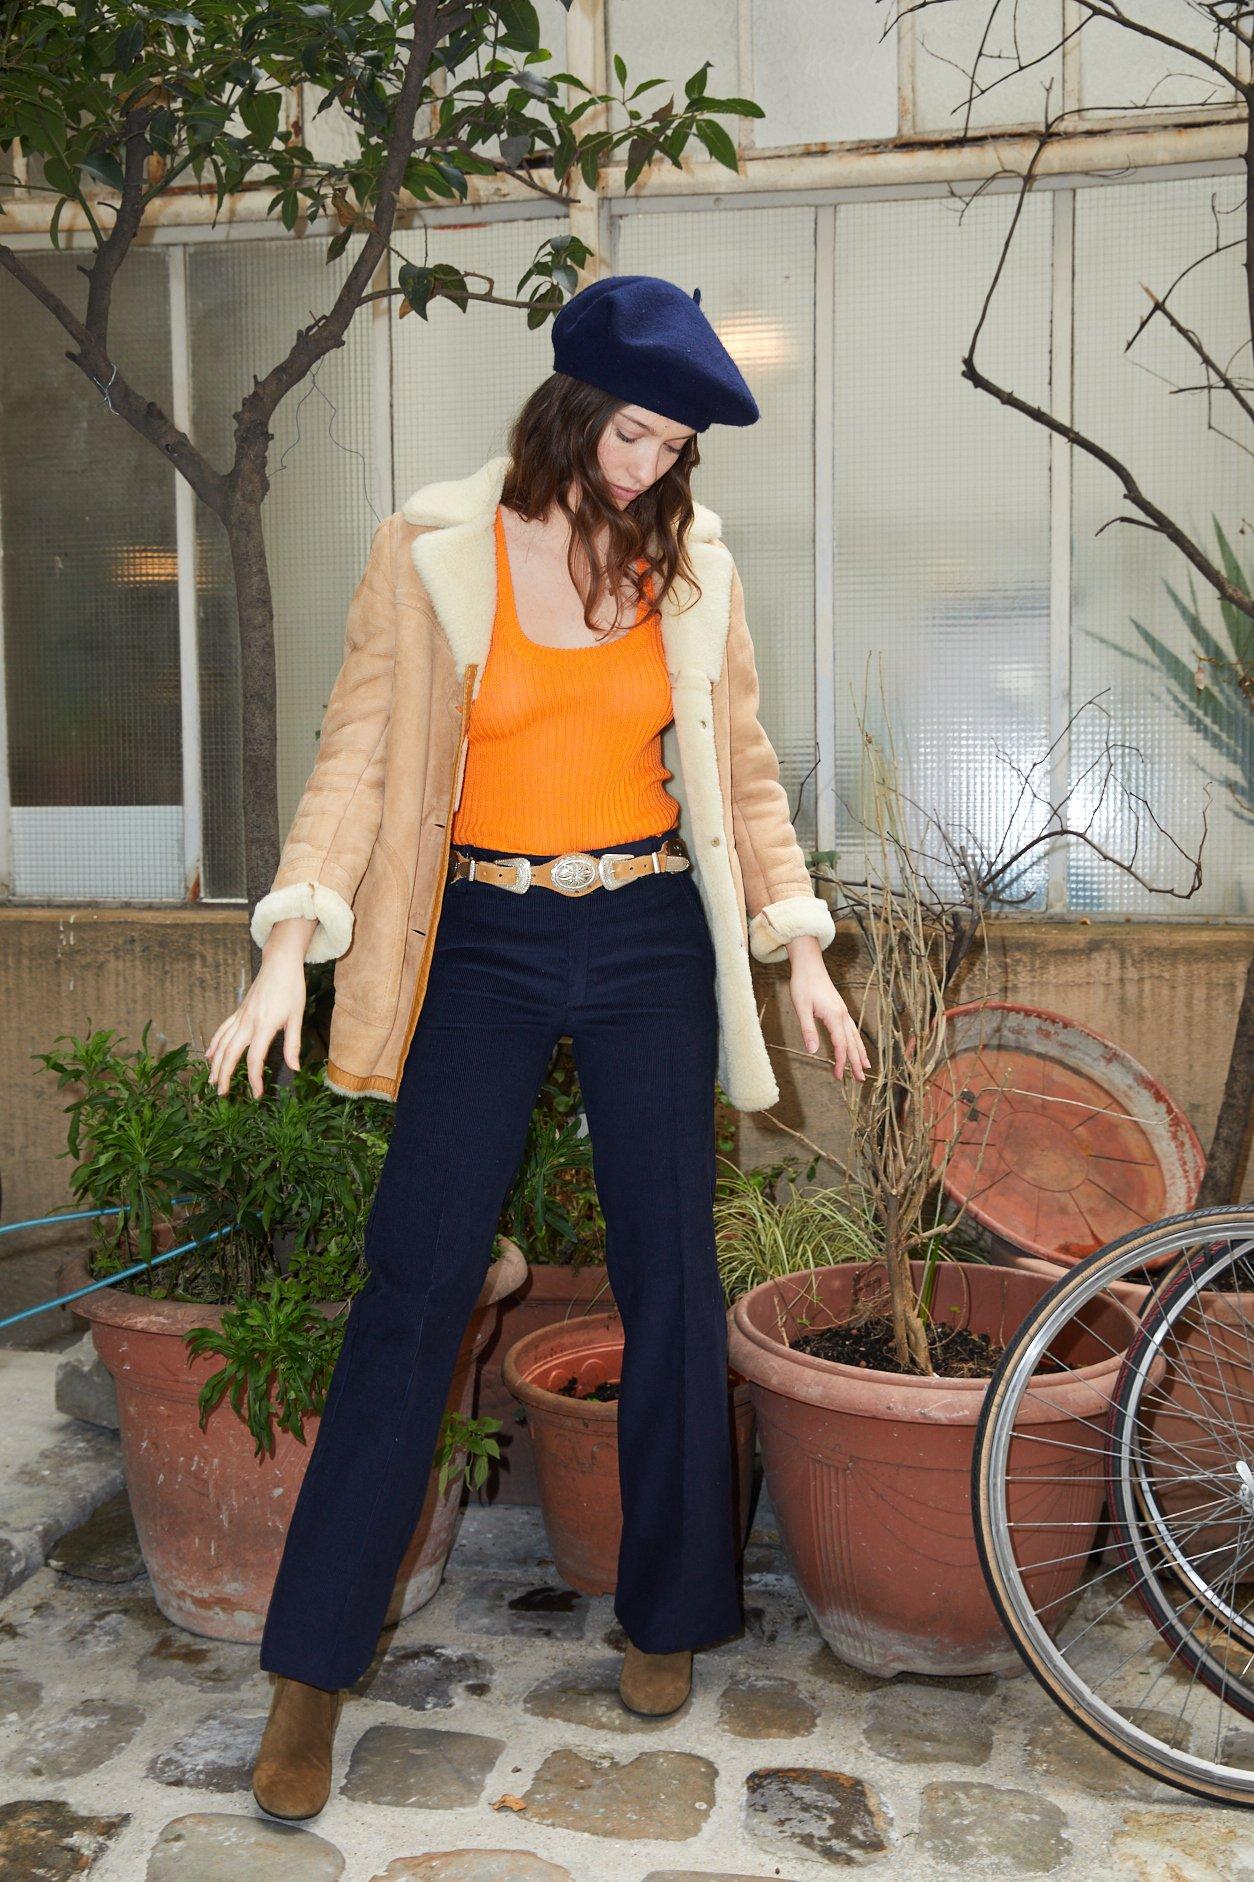 Pantalons - Pantalon flare velours côtelé